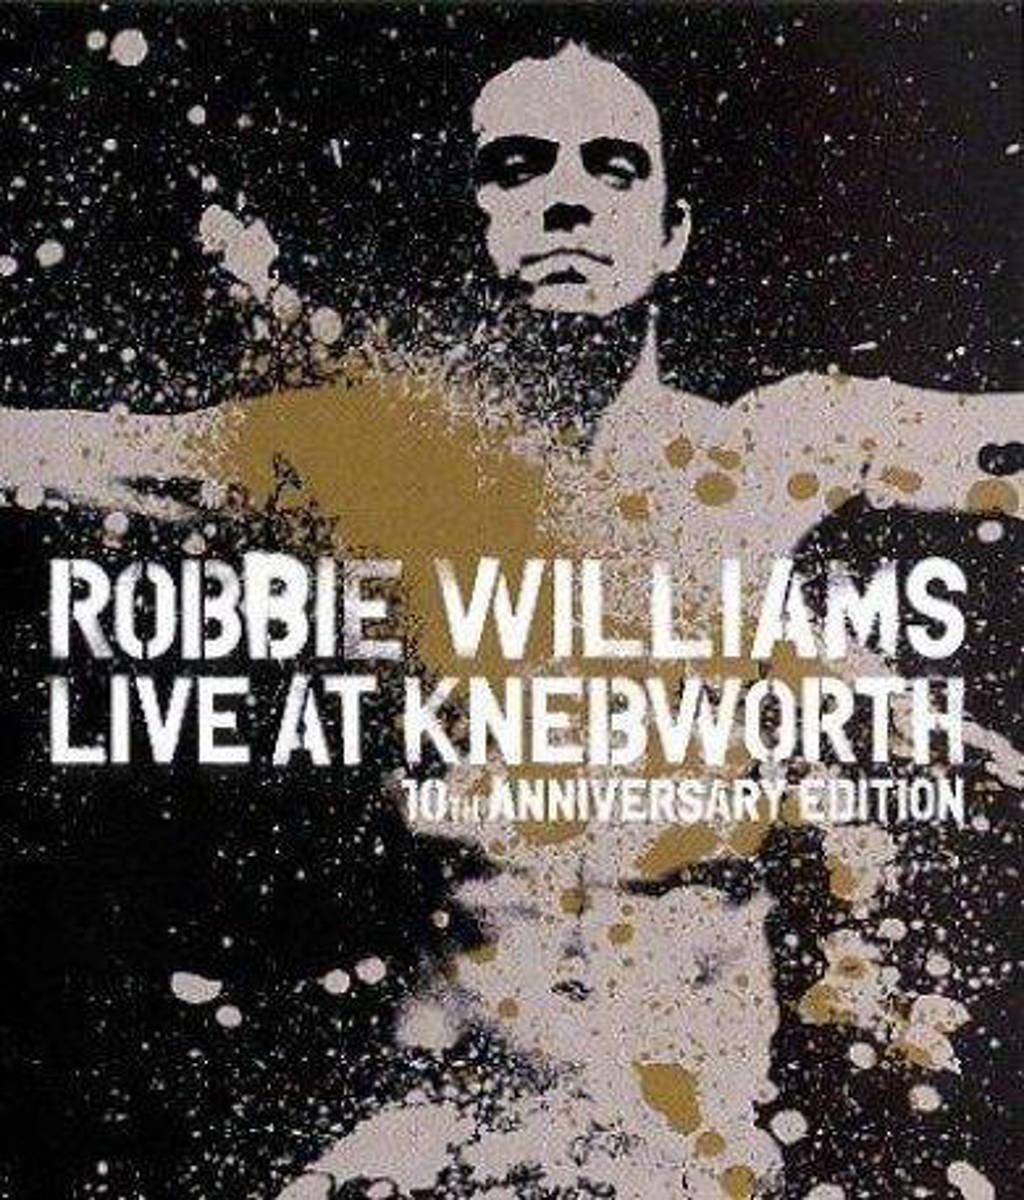 Robbie Williams - Live at Knebworth, 10th anniversary (Blu-ray)